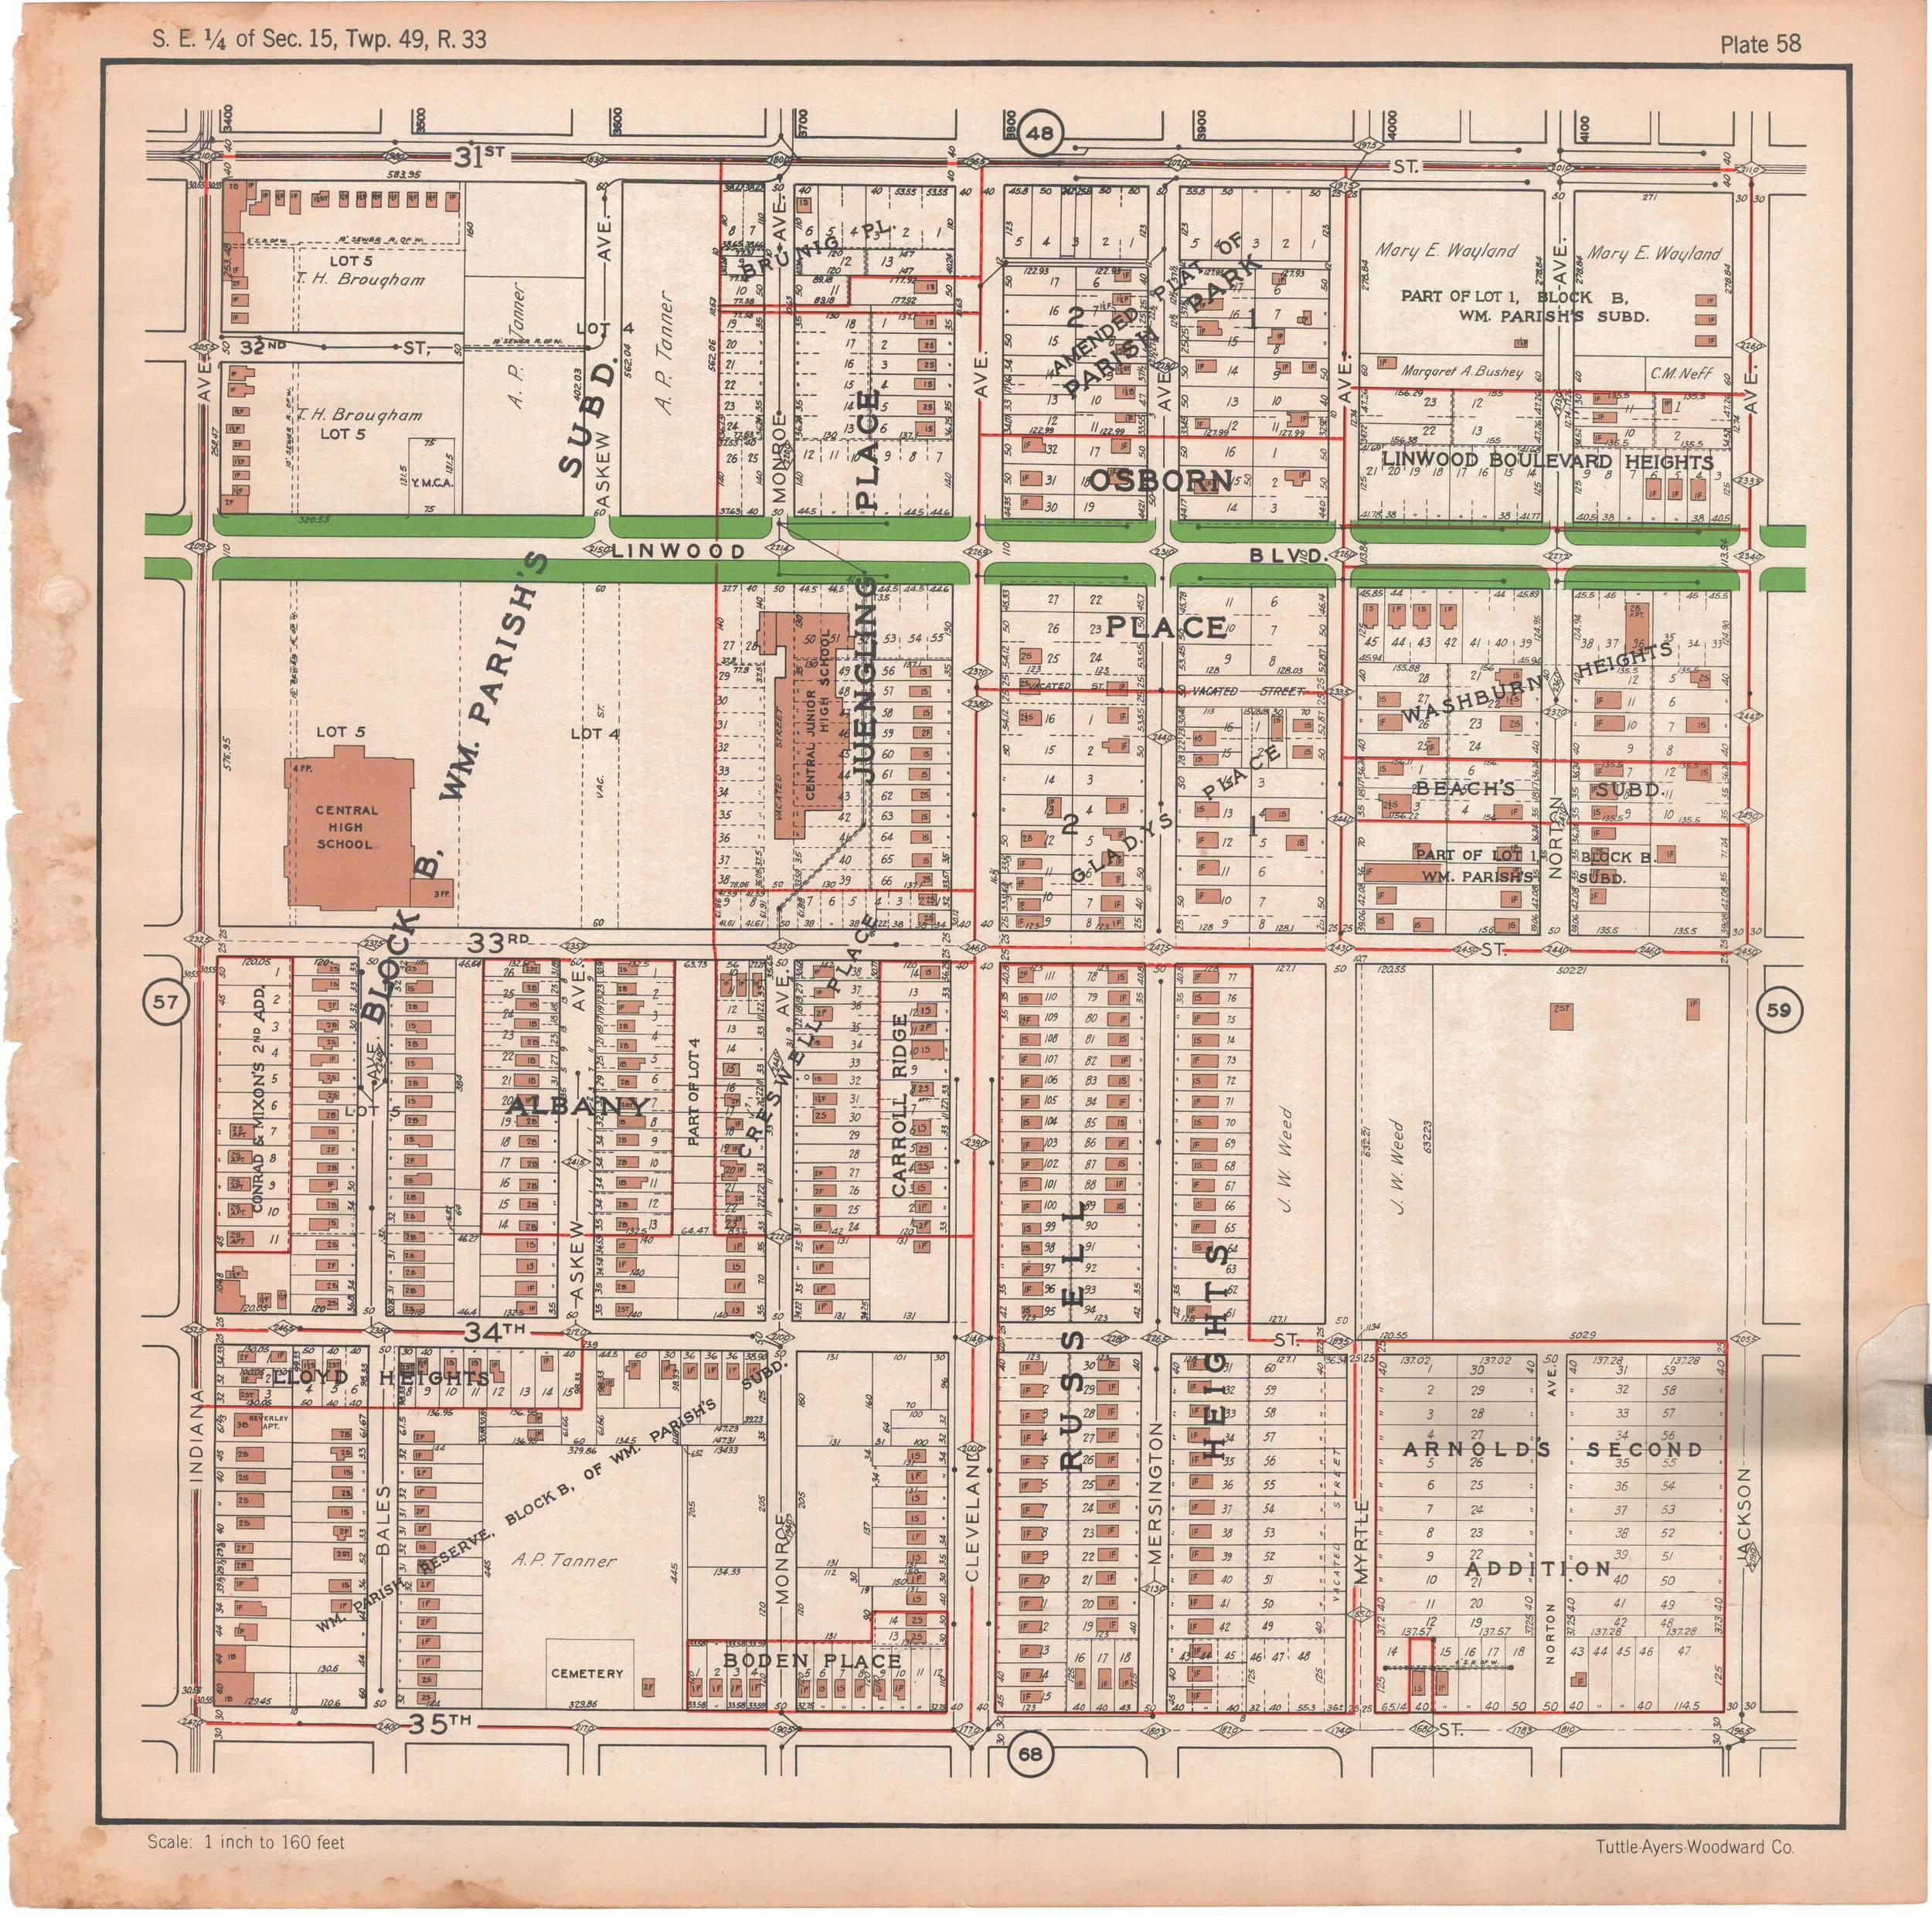 1925 TUTTLE_AYERS_Plate 58.JPG